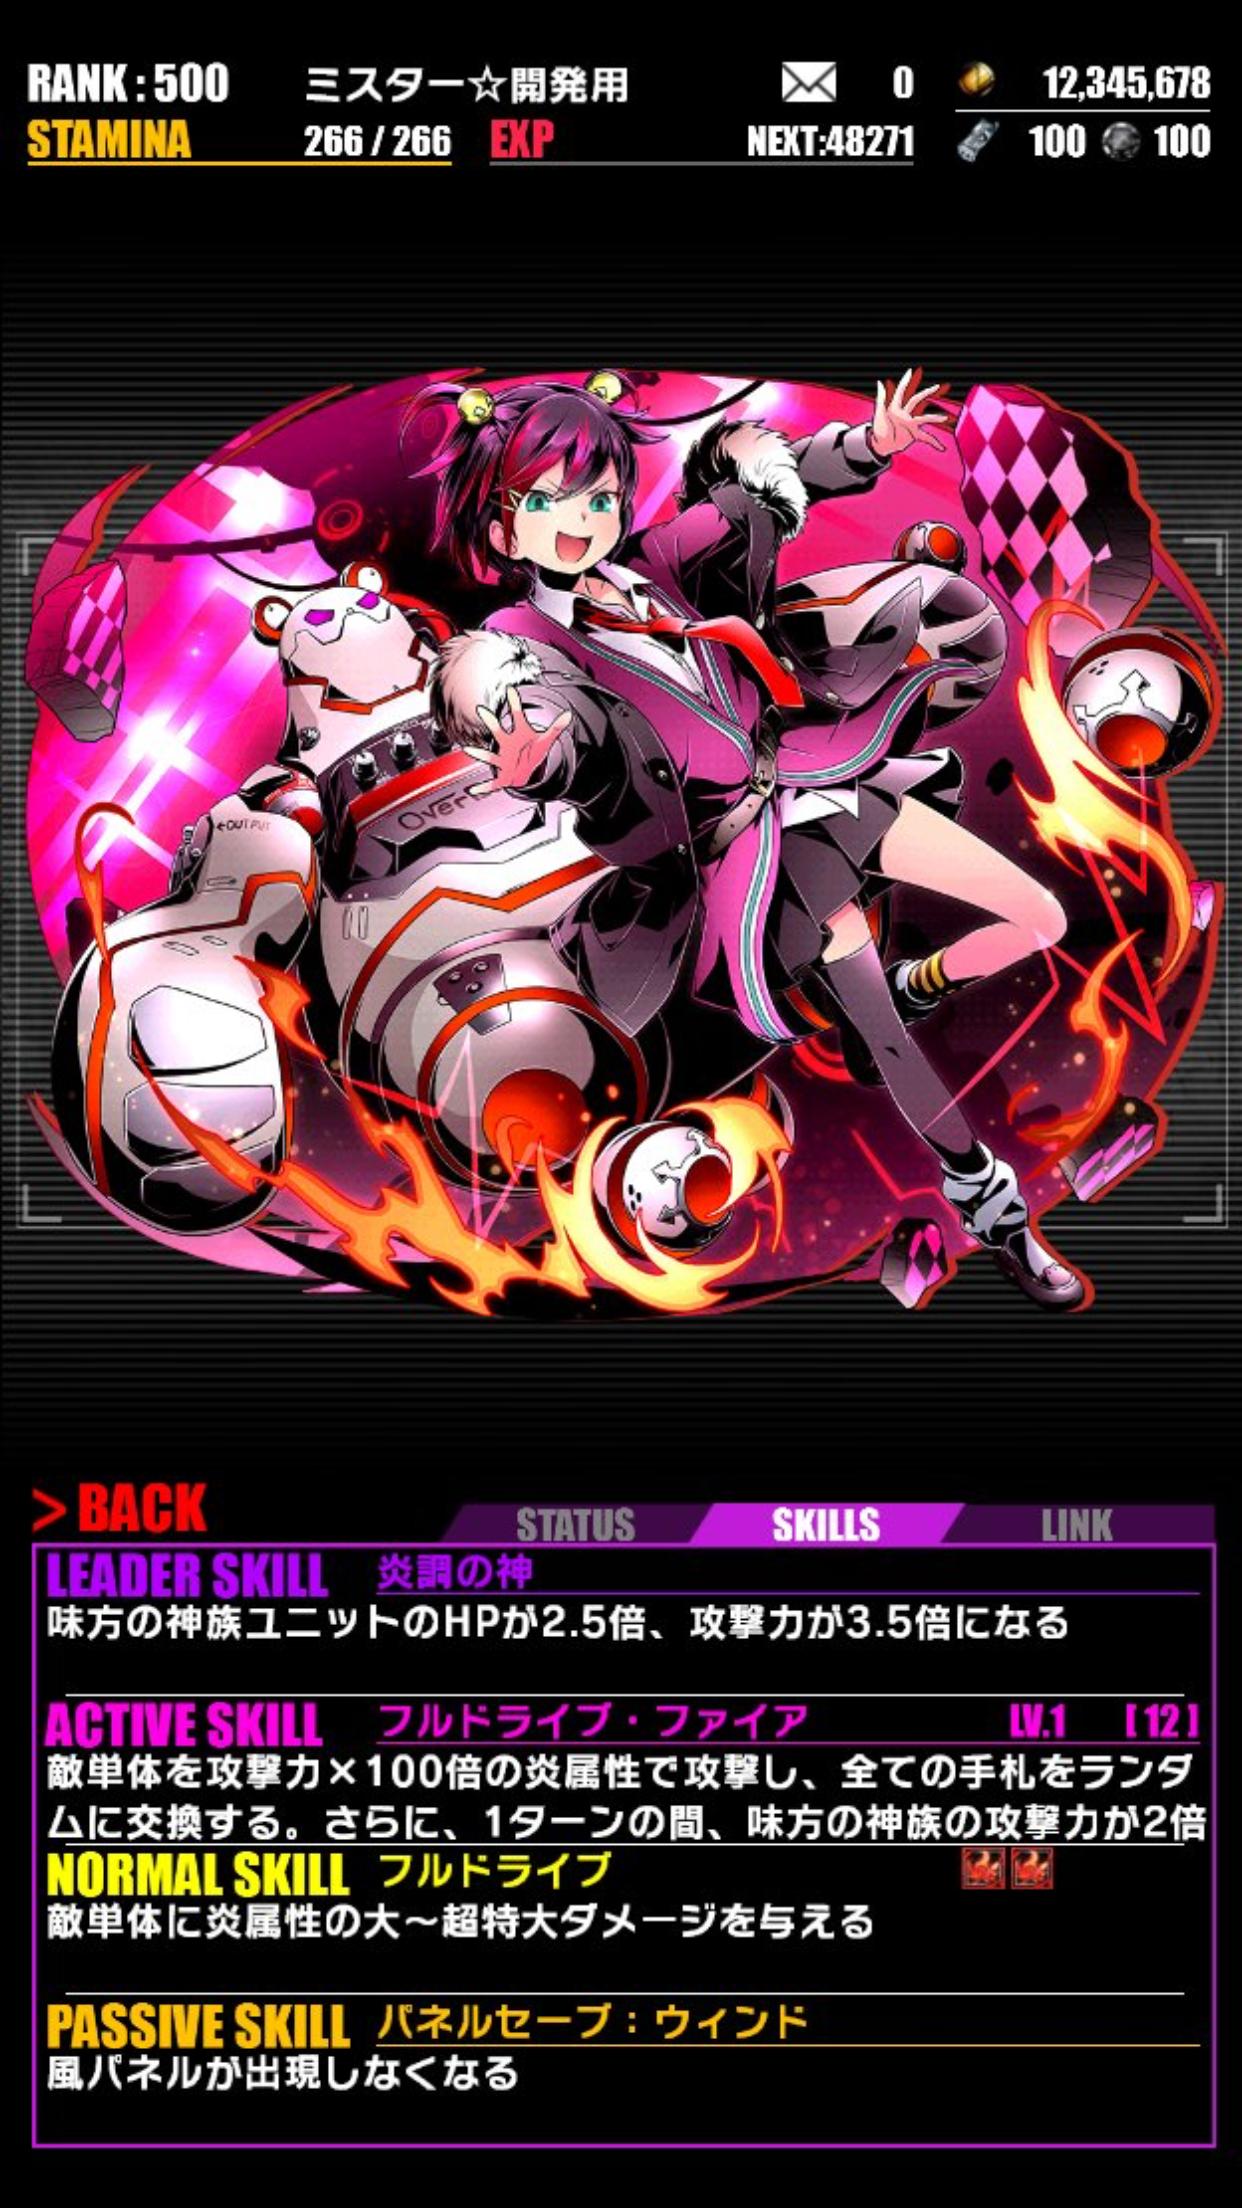 f:id:takumahakusyaku46:20170131020540p:image